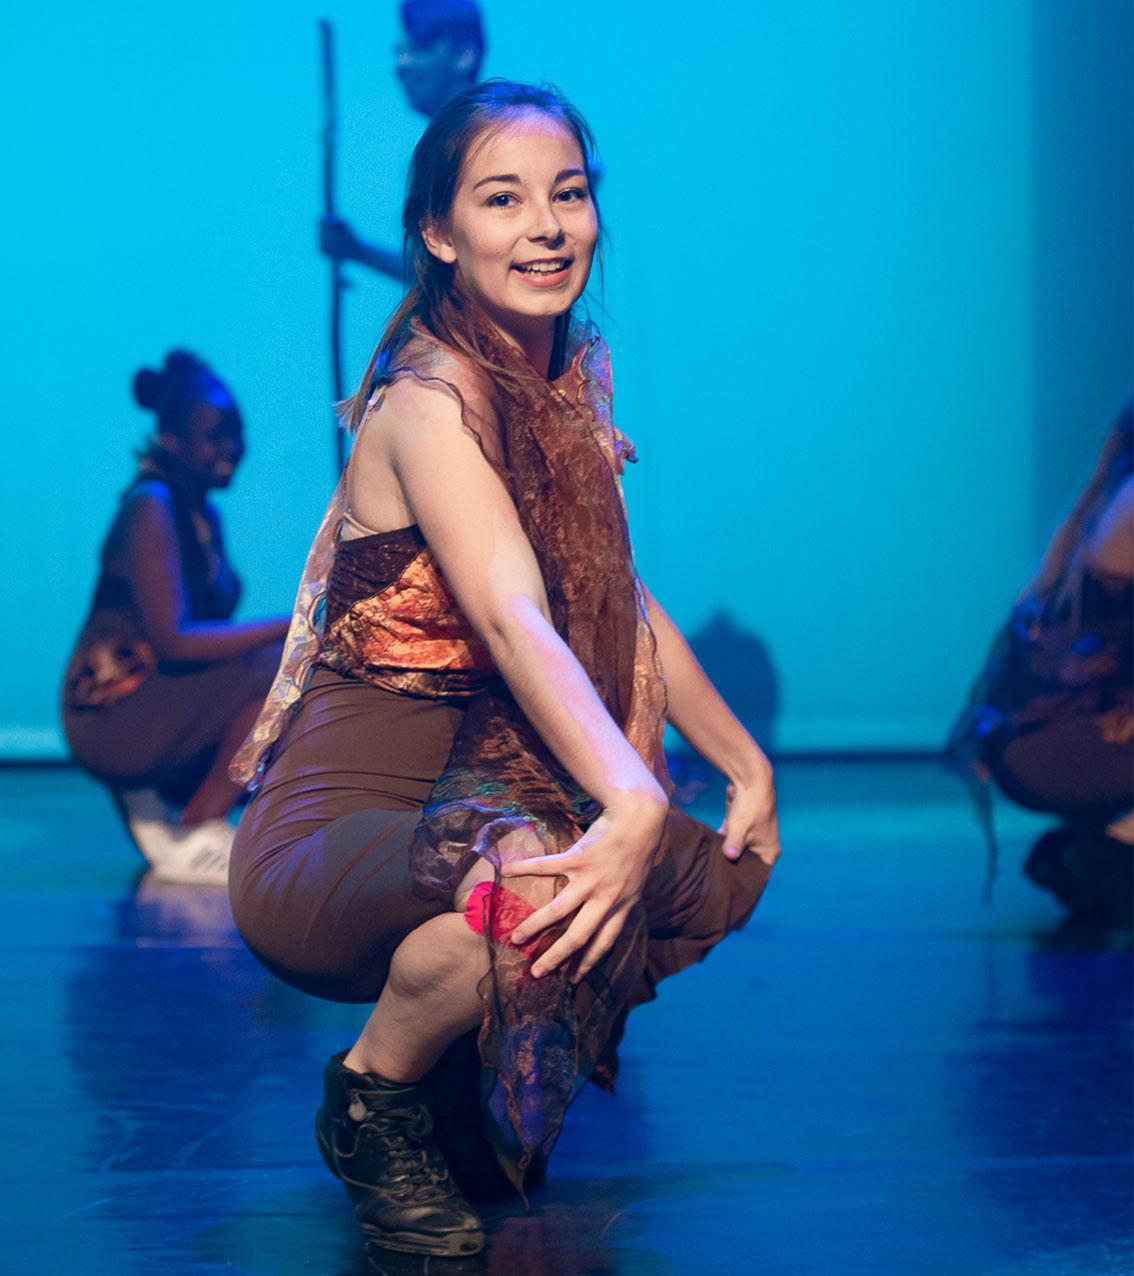 Prof de danse, Clémence